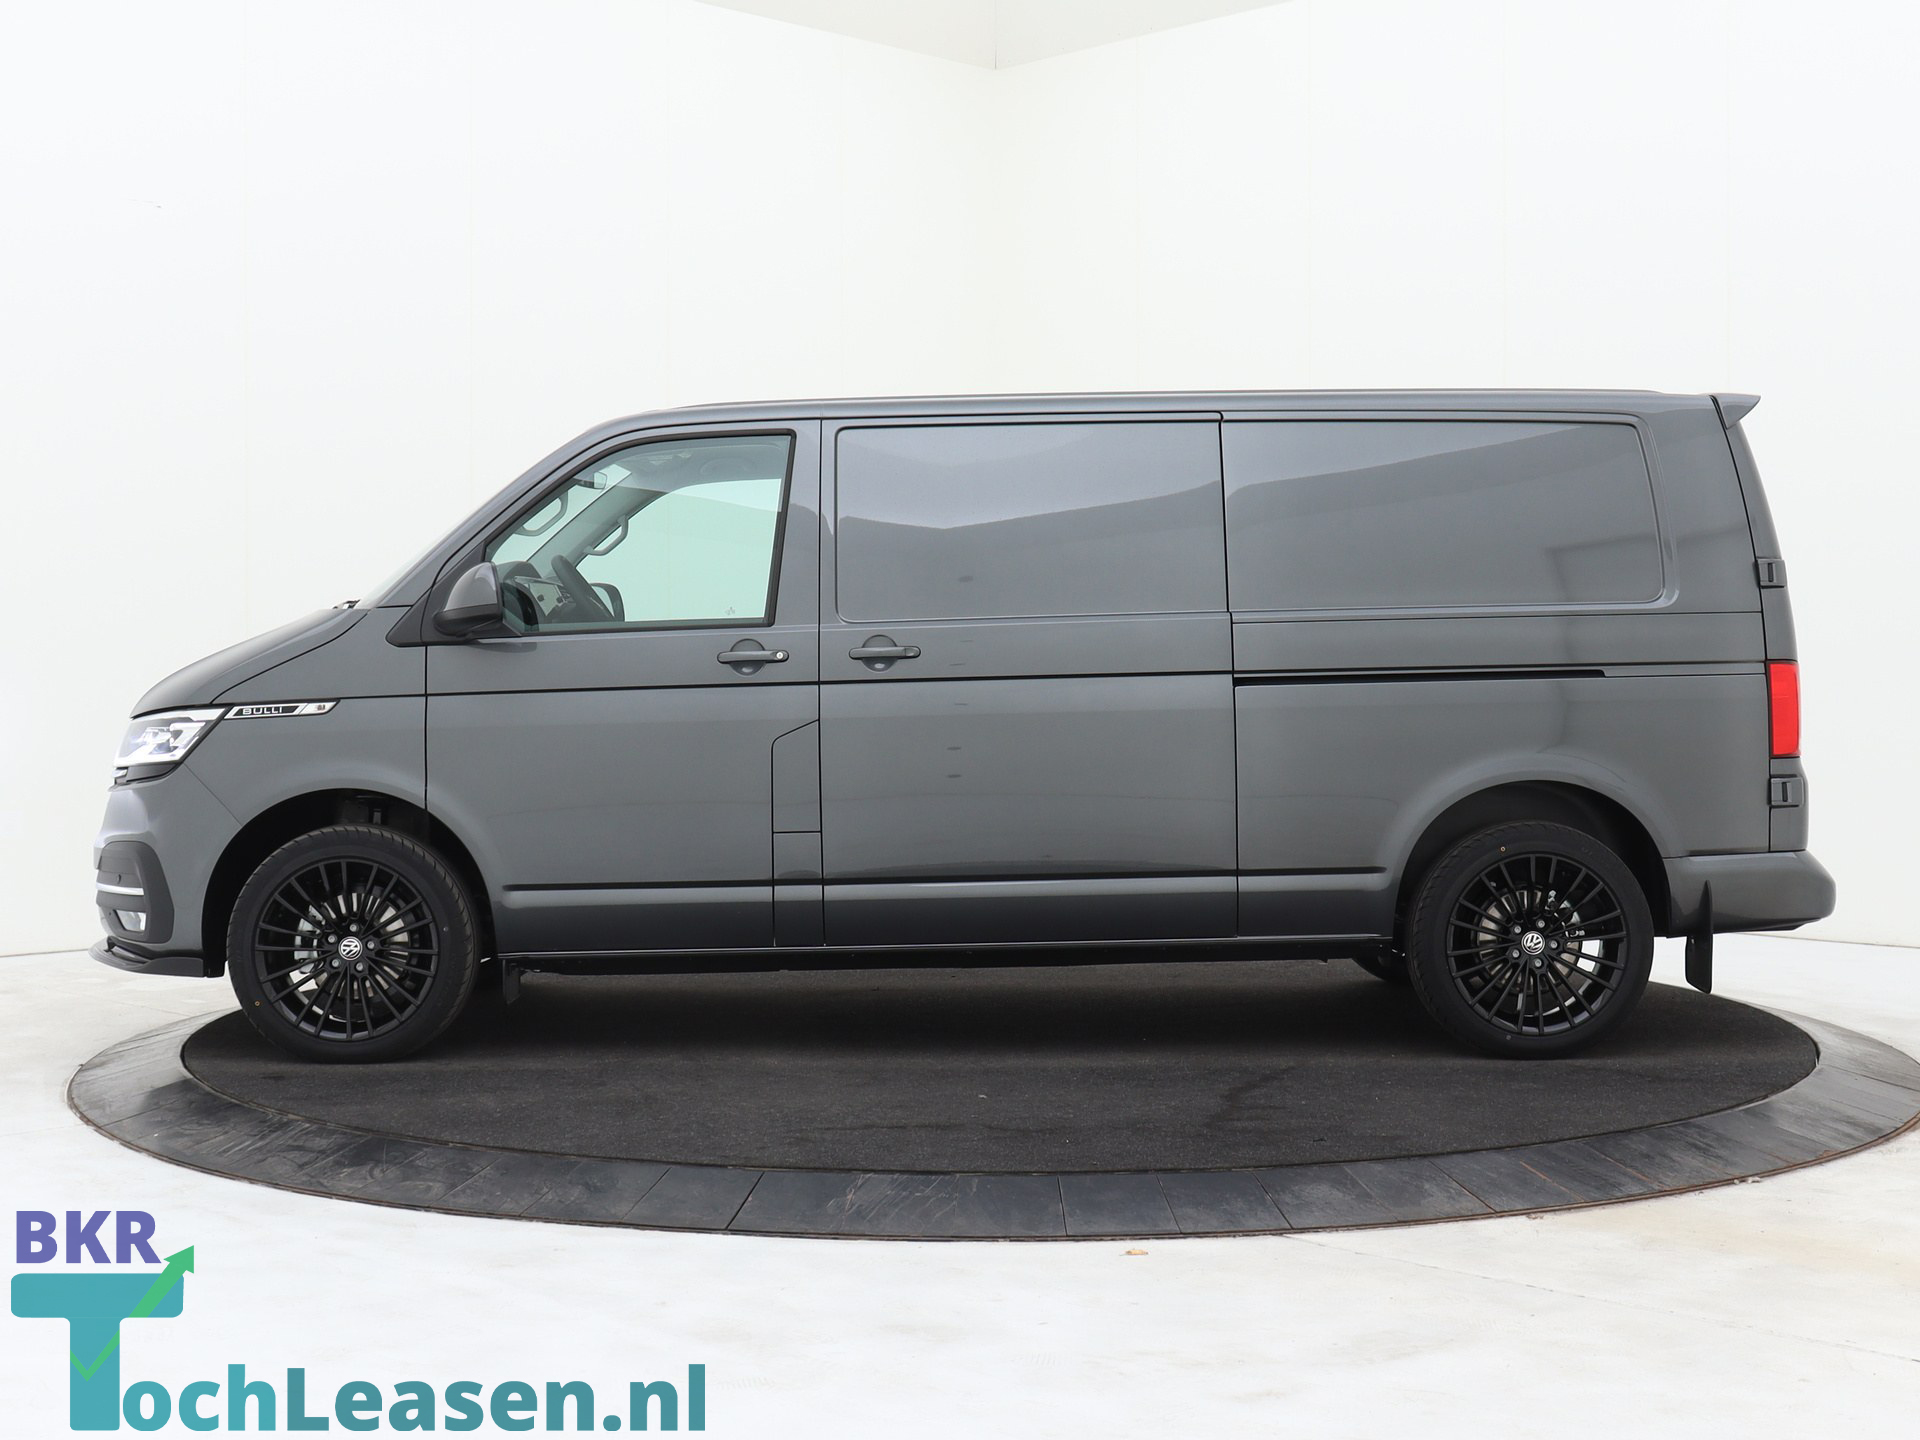 BKR toch leasen - Volkswagen Transporter - Grijs 8